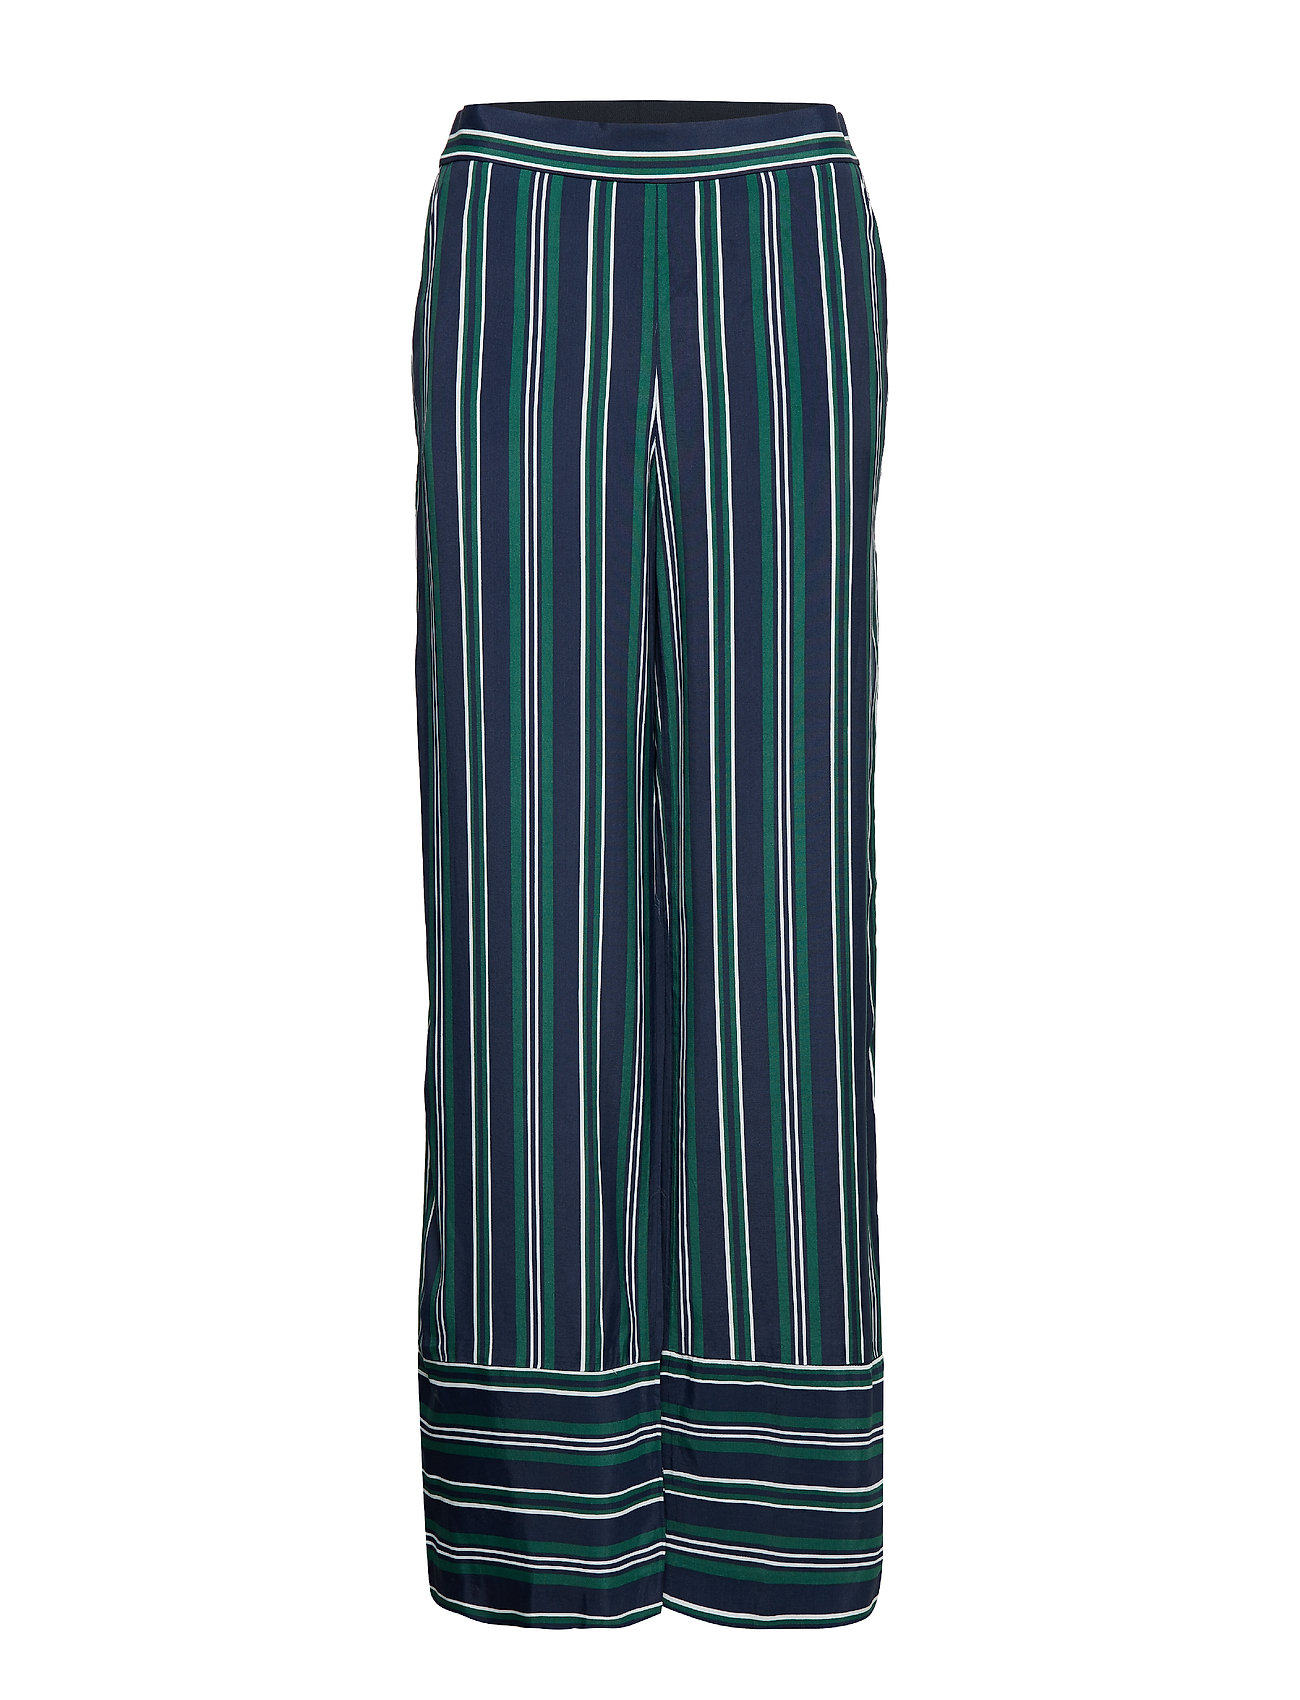 66851672dc8 DARK TEAL GREEN Esprit Pants Woven bukser for dame - Pashion.dk